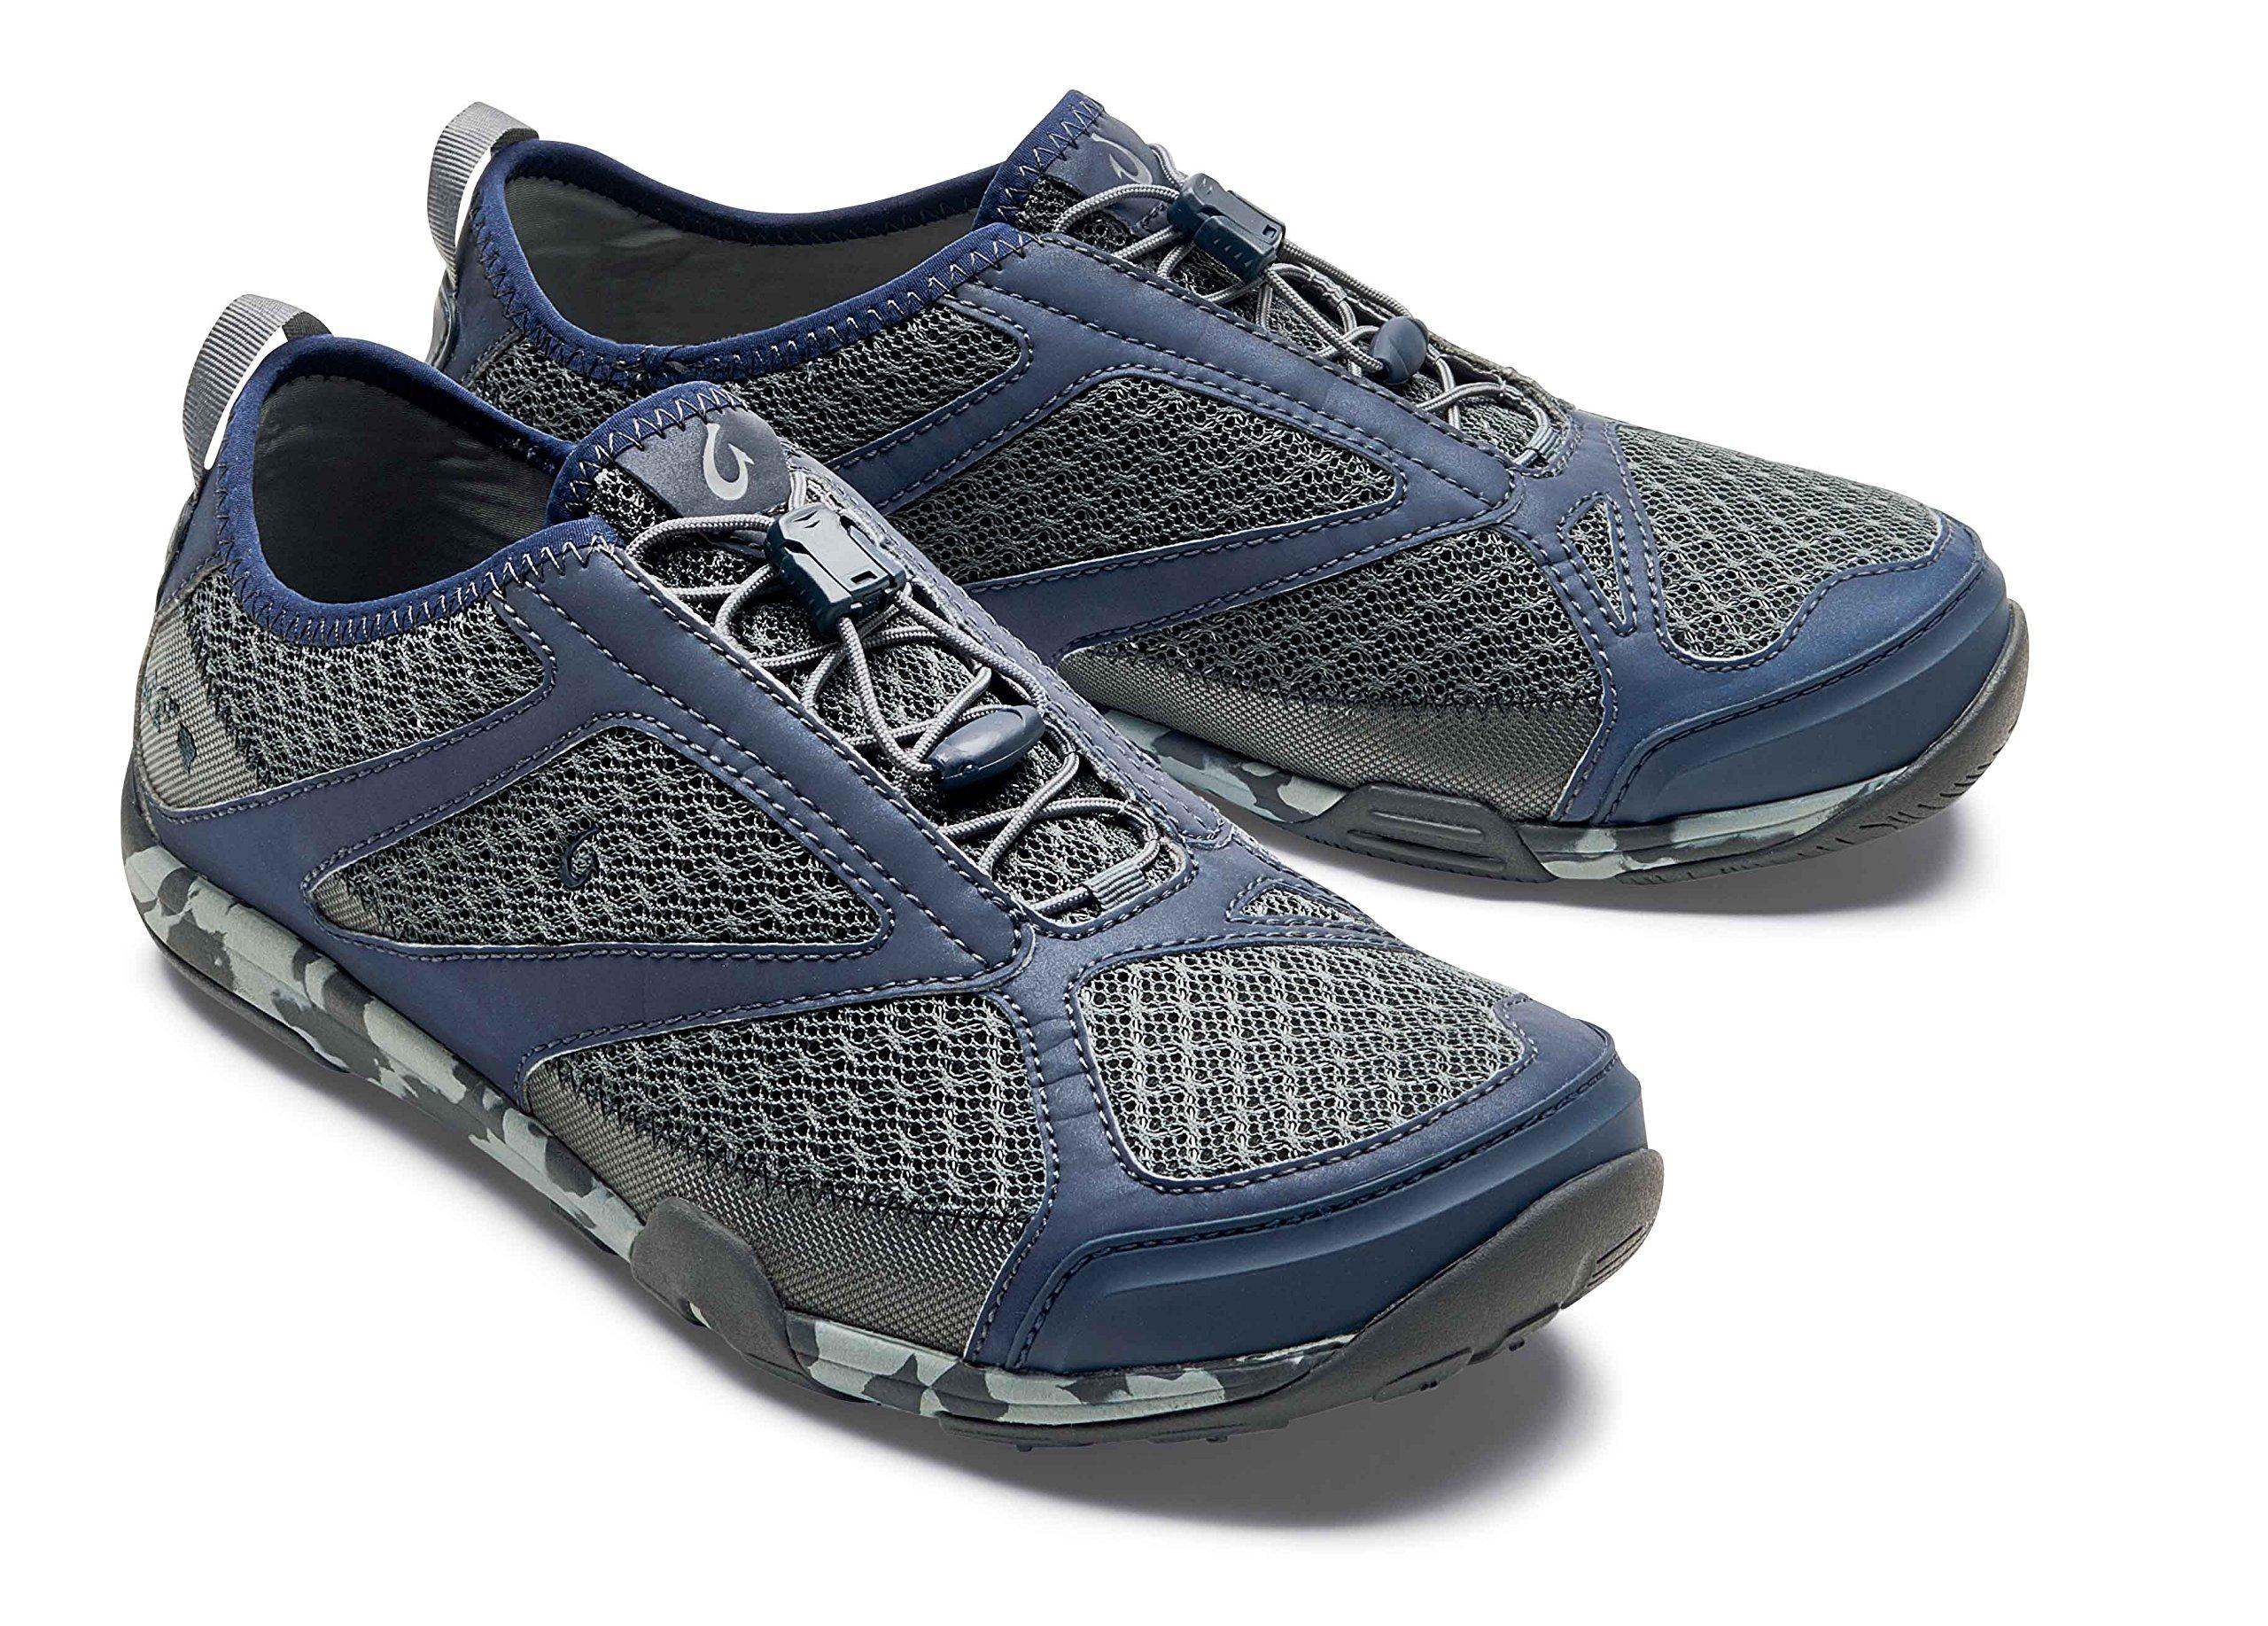 OluKai New Men's 'Eleu Trainer Water Shoe Charcoal/Trench Blue 11